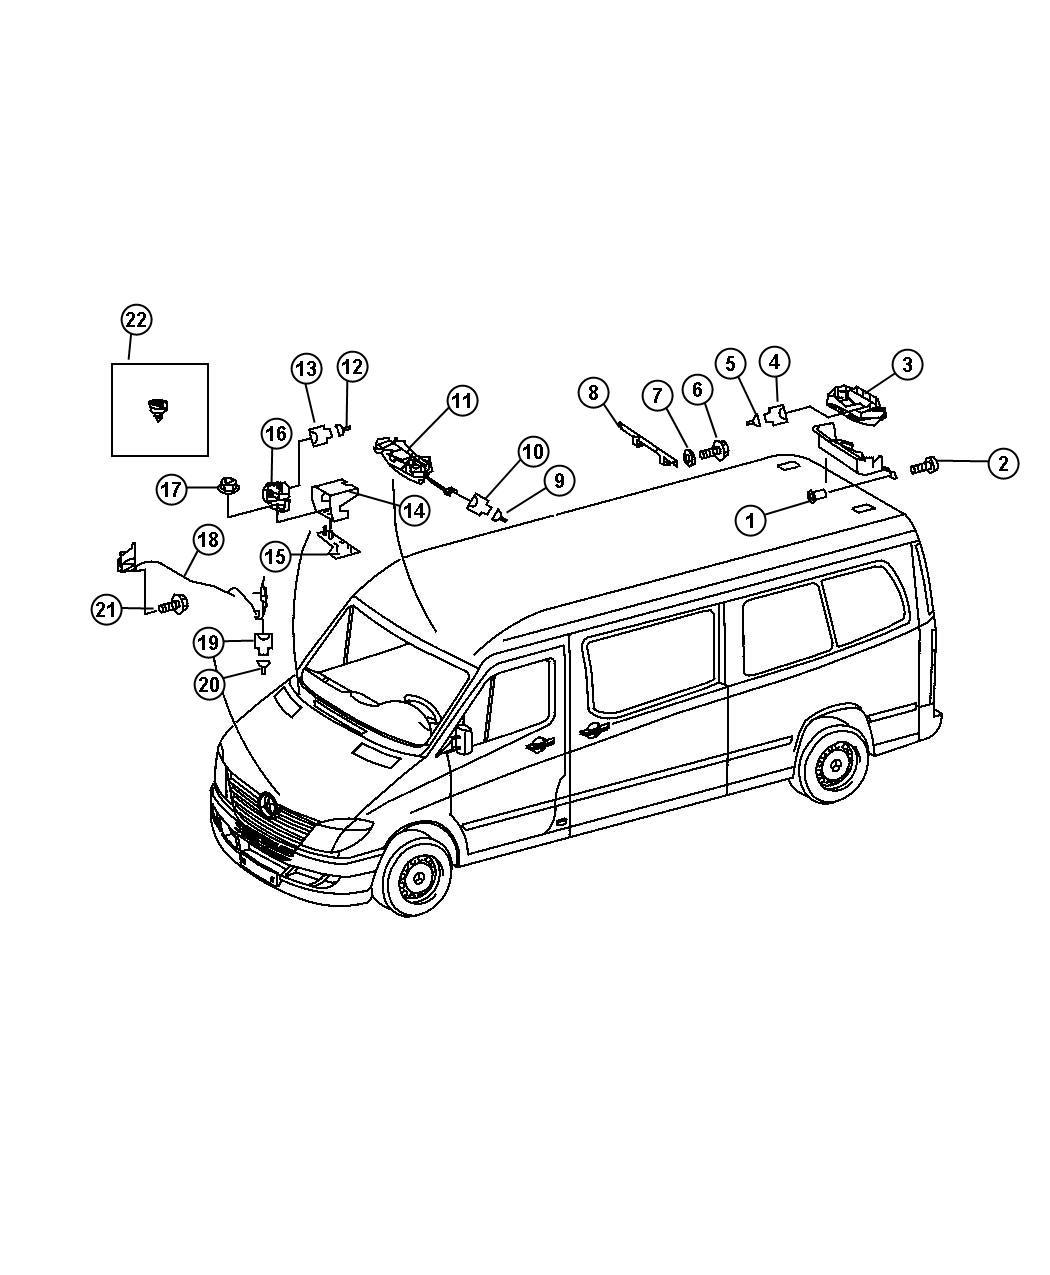 Dodge Sprinter Switch Security Alarm Underhood Siren